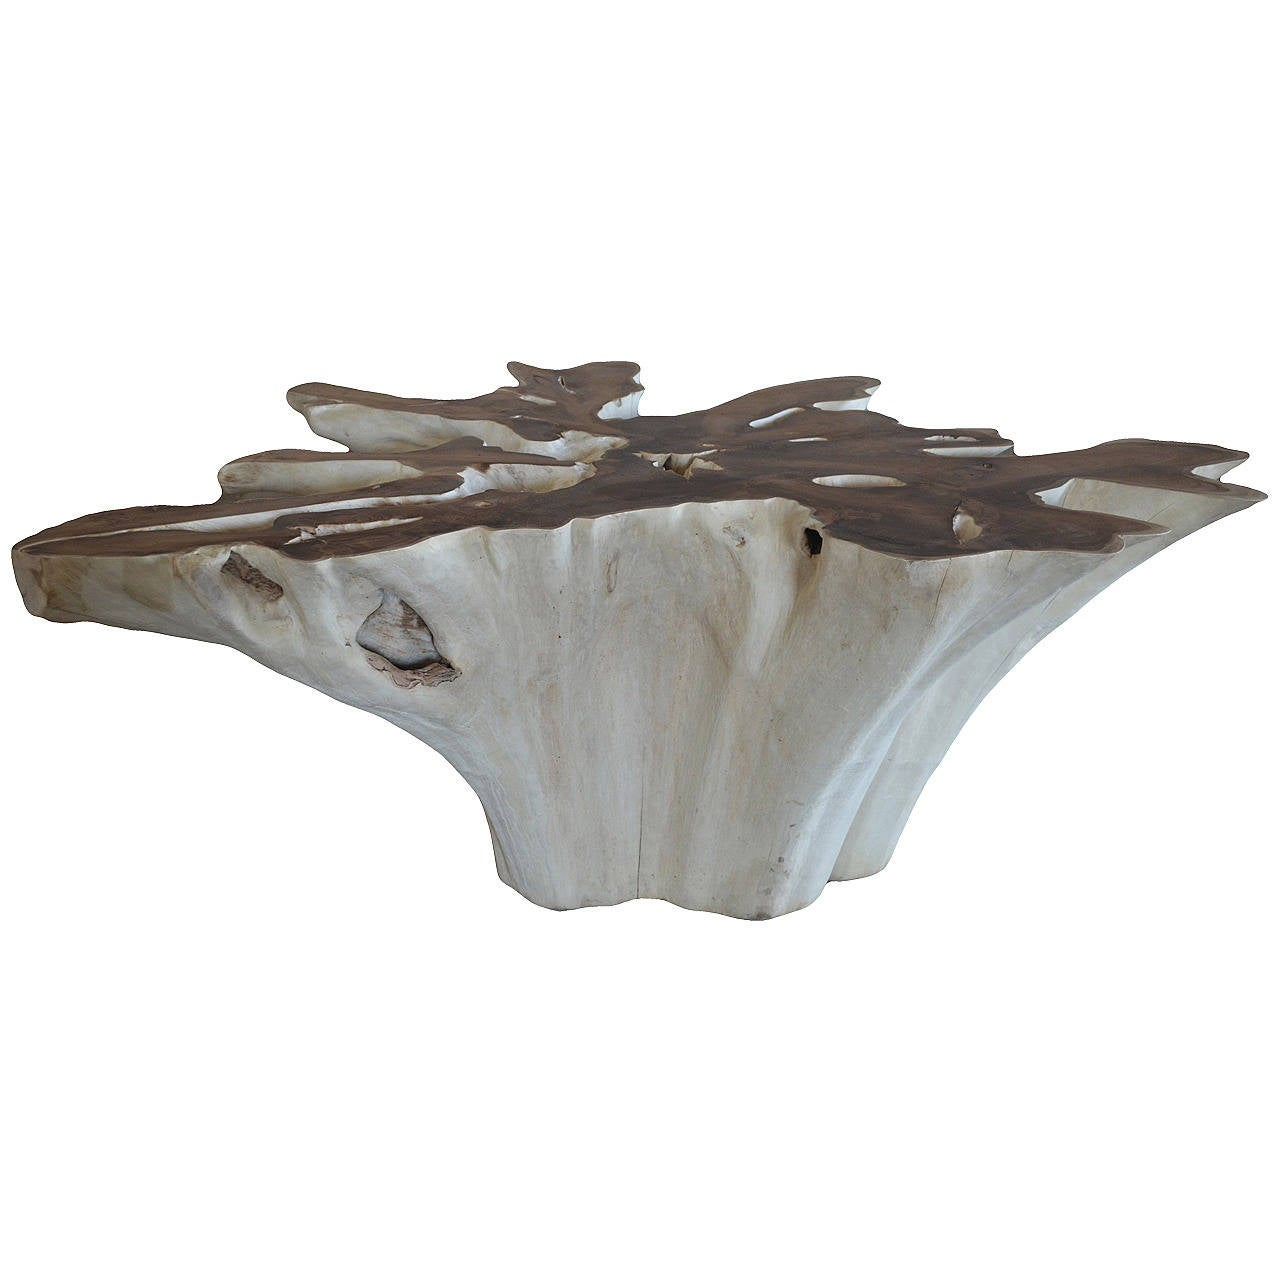 pair ductile iron table legs second sunco bedroom furniture solutions bedroom furniture solutions